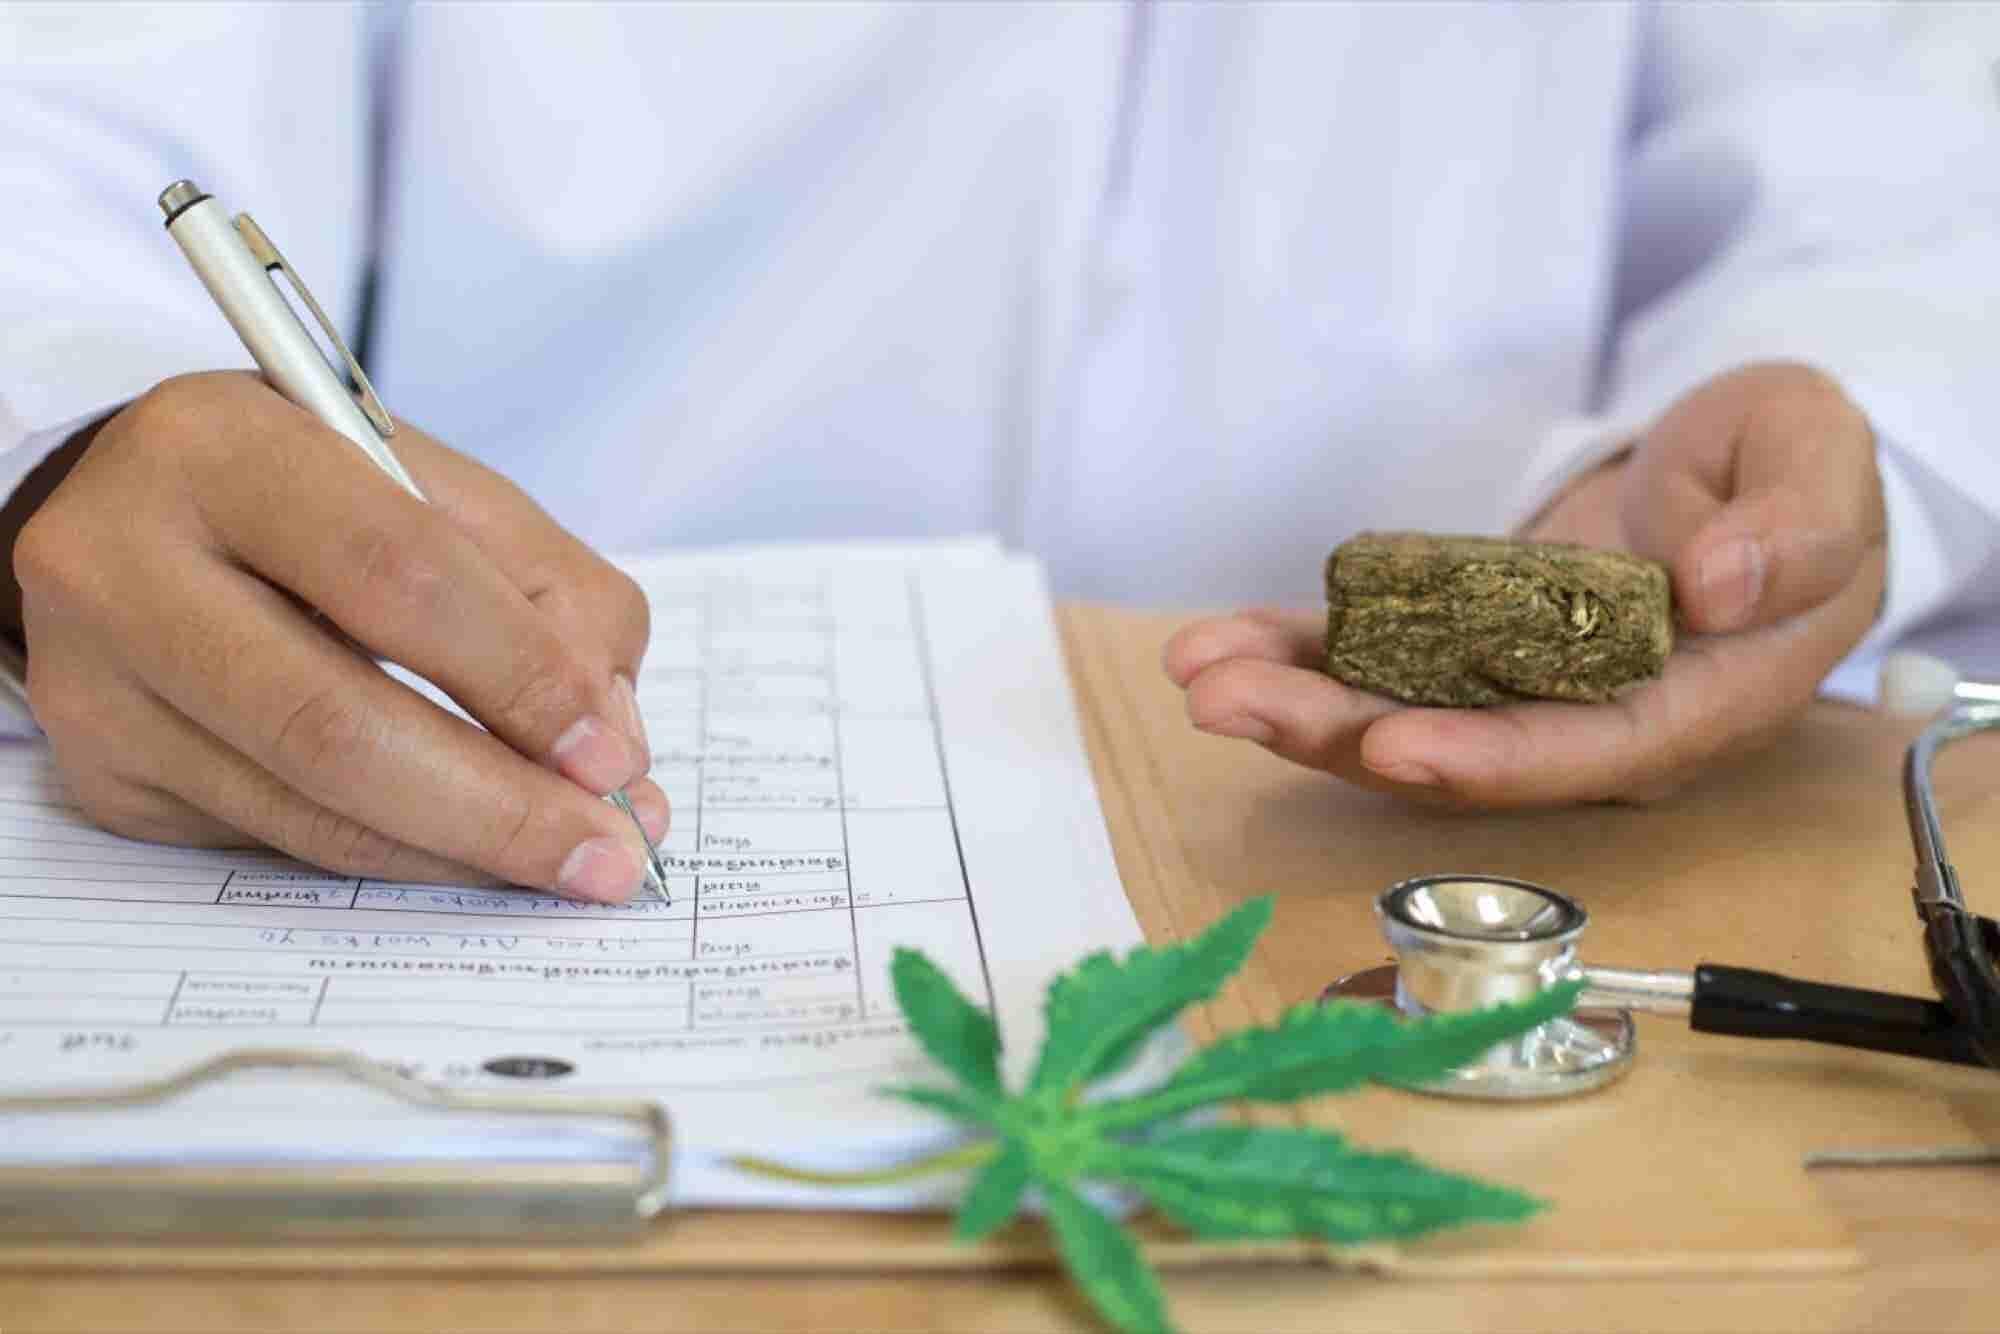 Burgeoning Marijuana Industry Has a Growing Need for Scientists